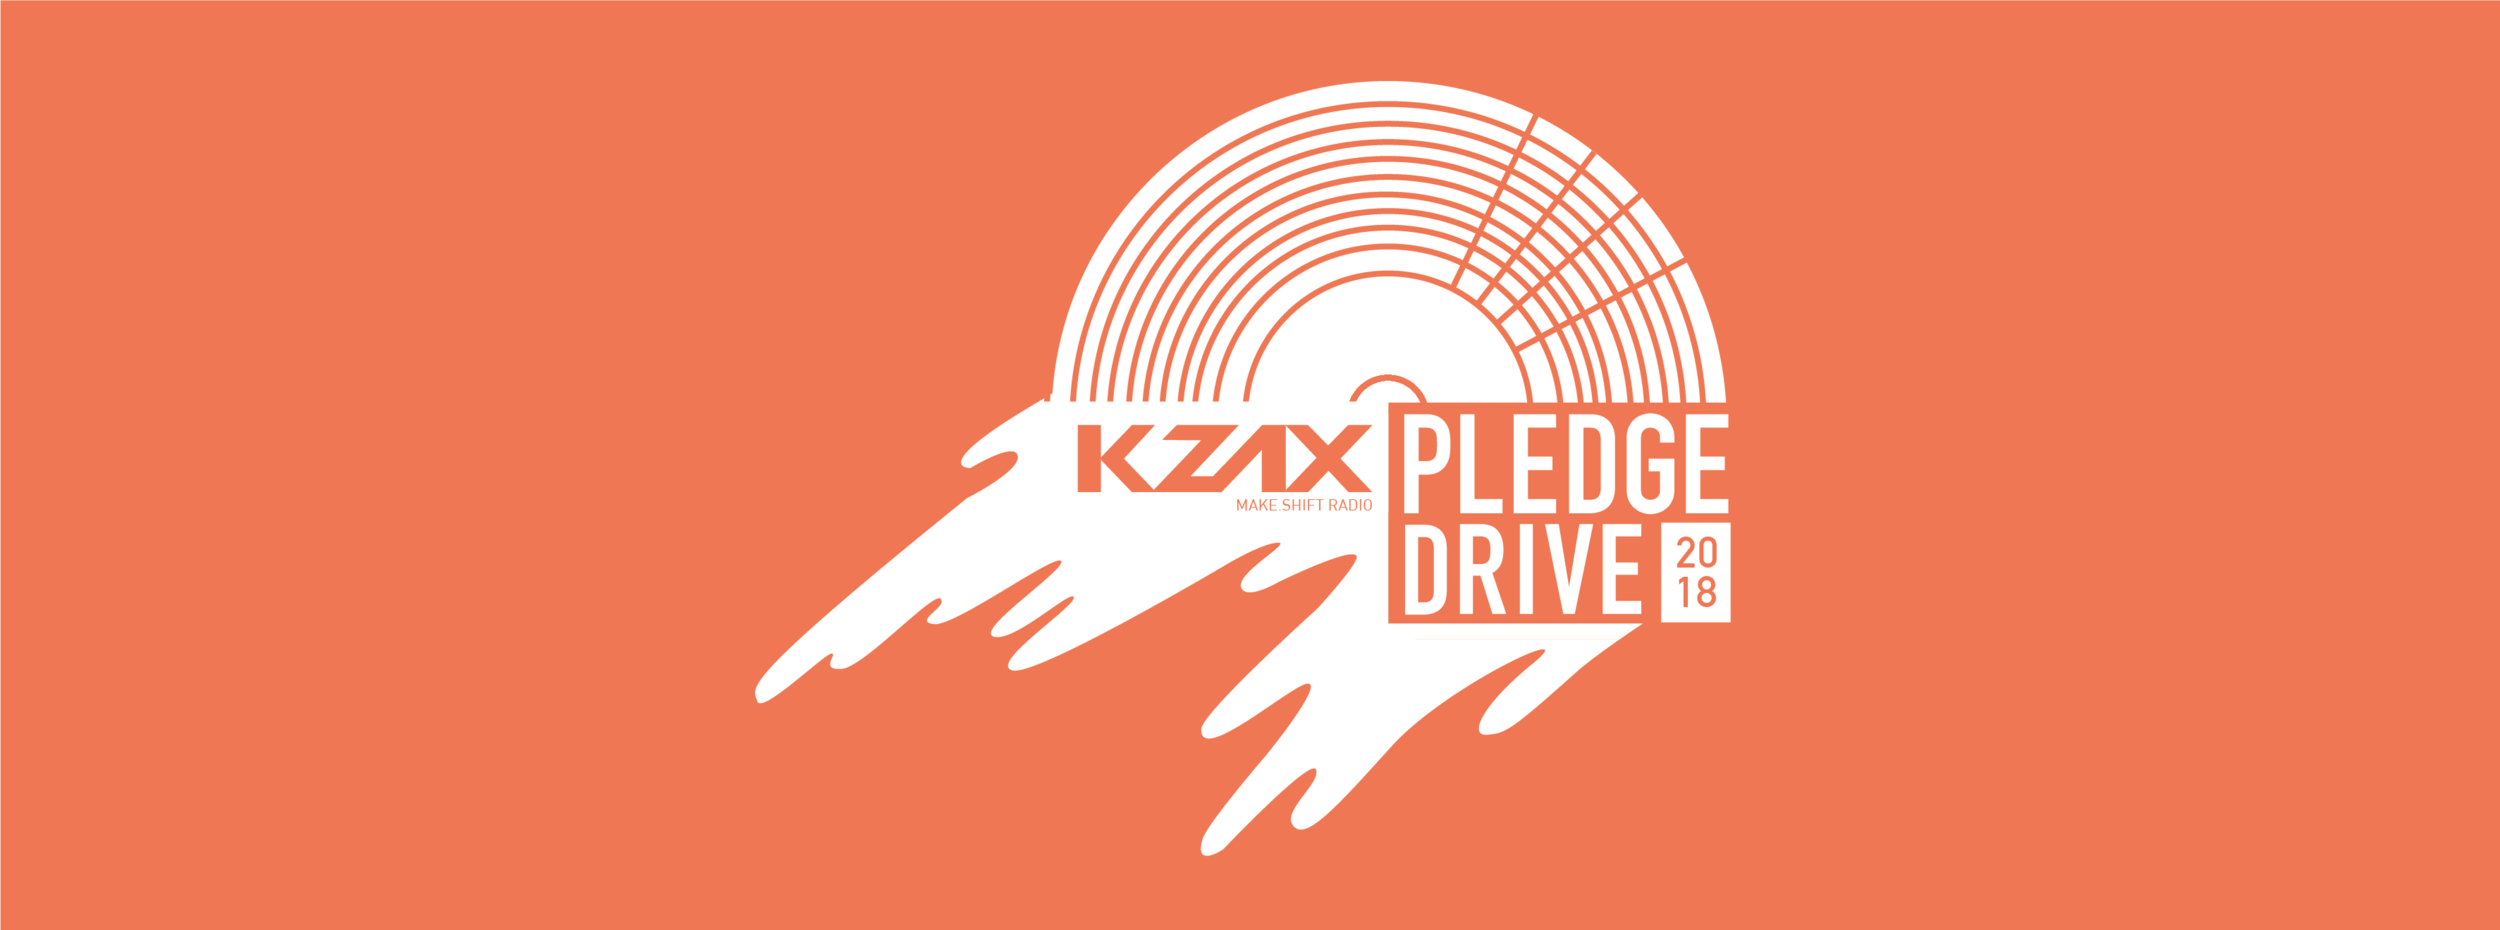 pledge drive header.png